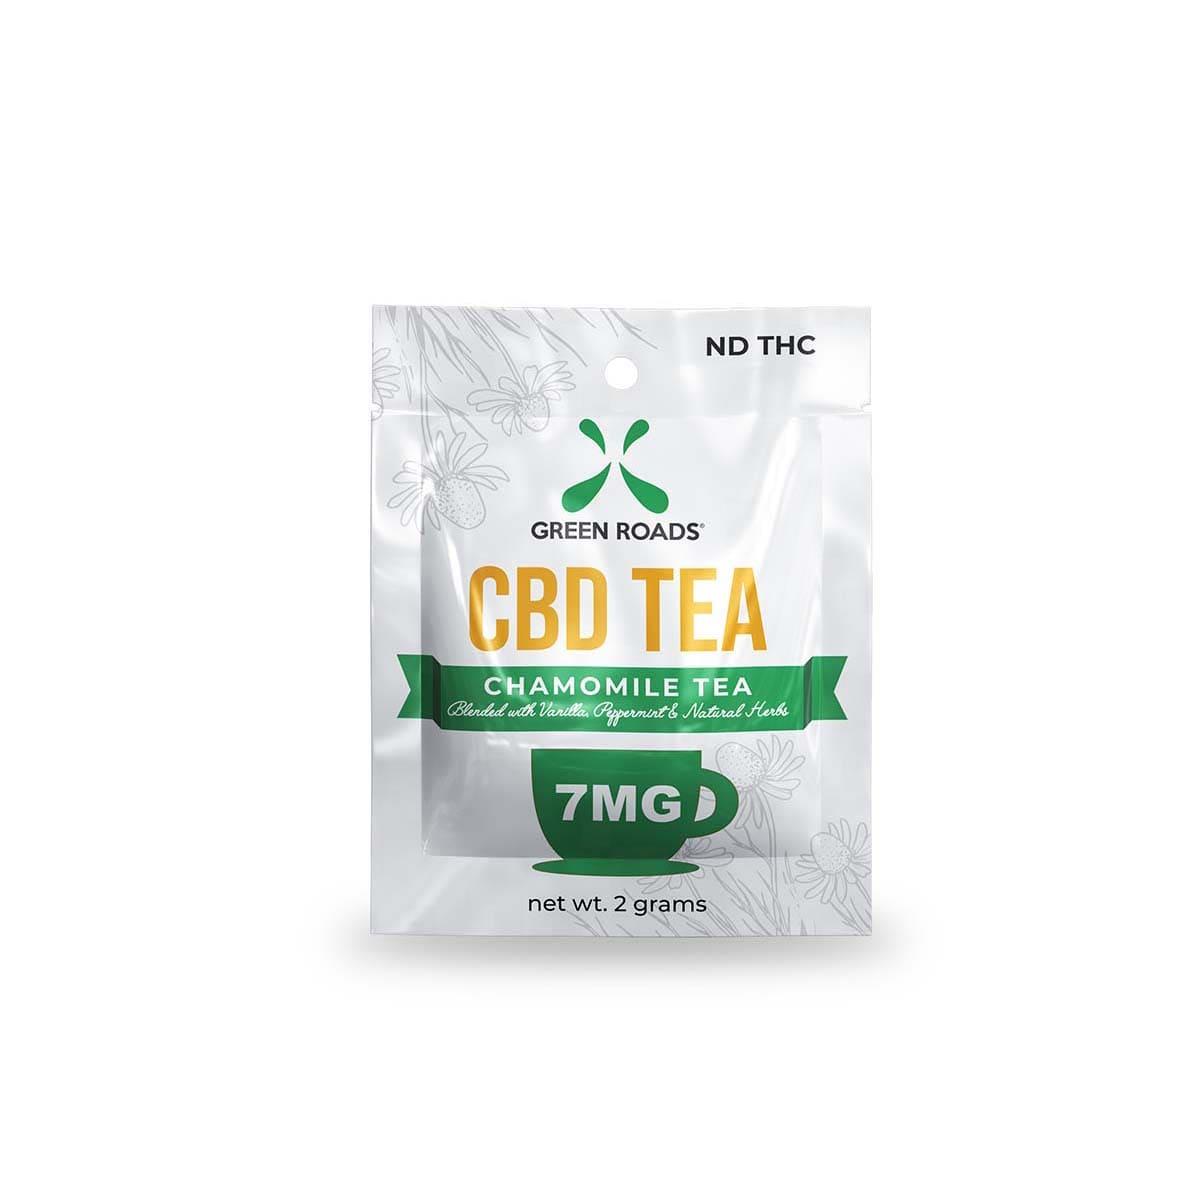 Green Roads CBD Tea - 7mg (7mg CBD / 2 G Tea) - 2grams